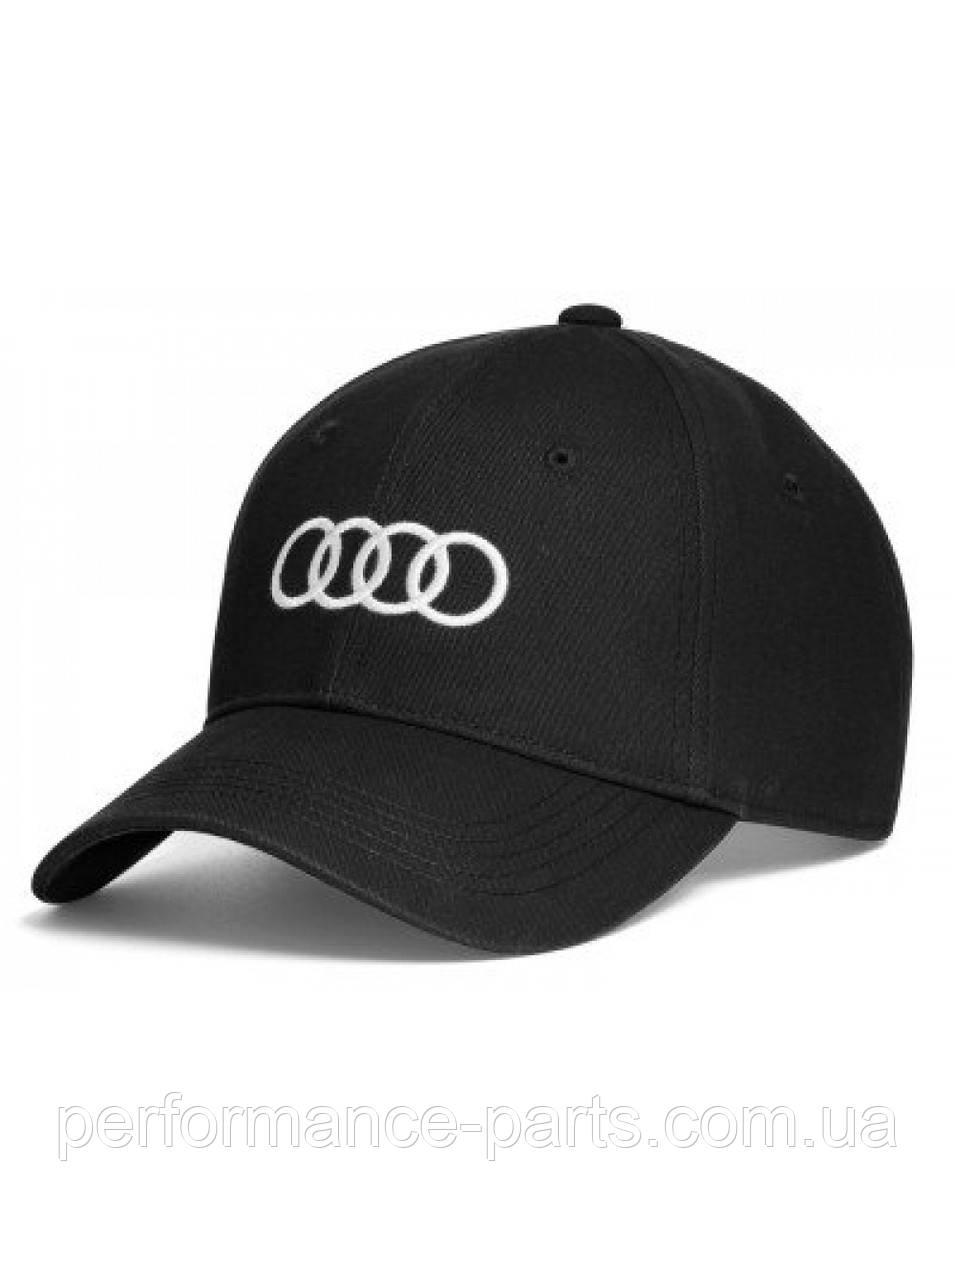 Бейсболка унісекс Audi Rings Unisex Baseball Cap, Black 3131701000